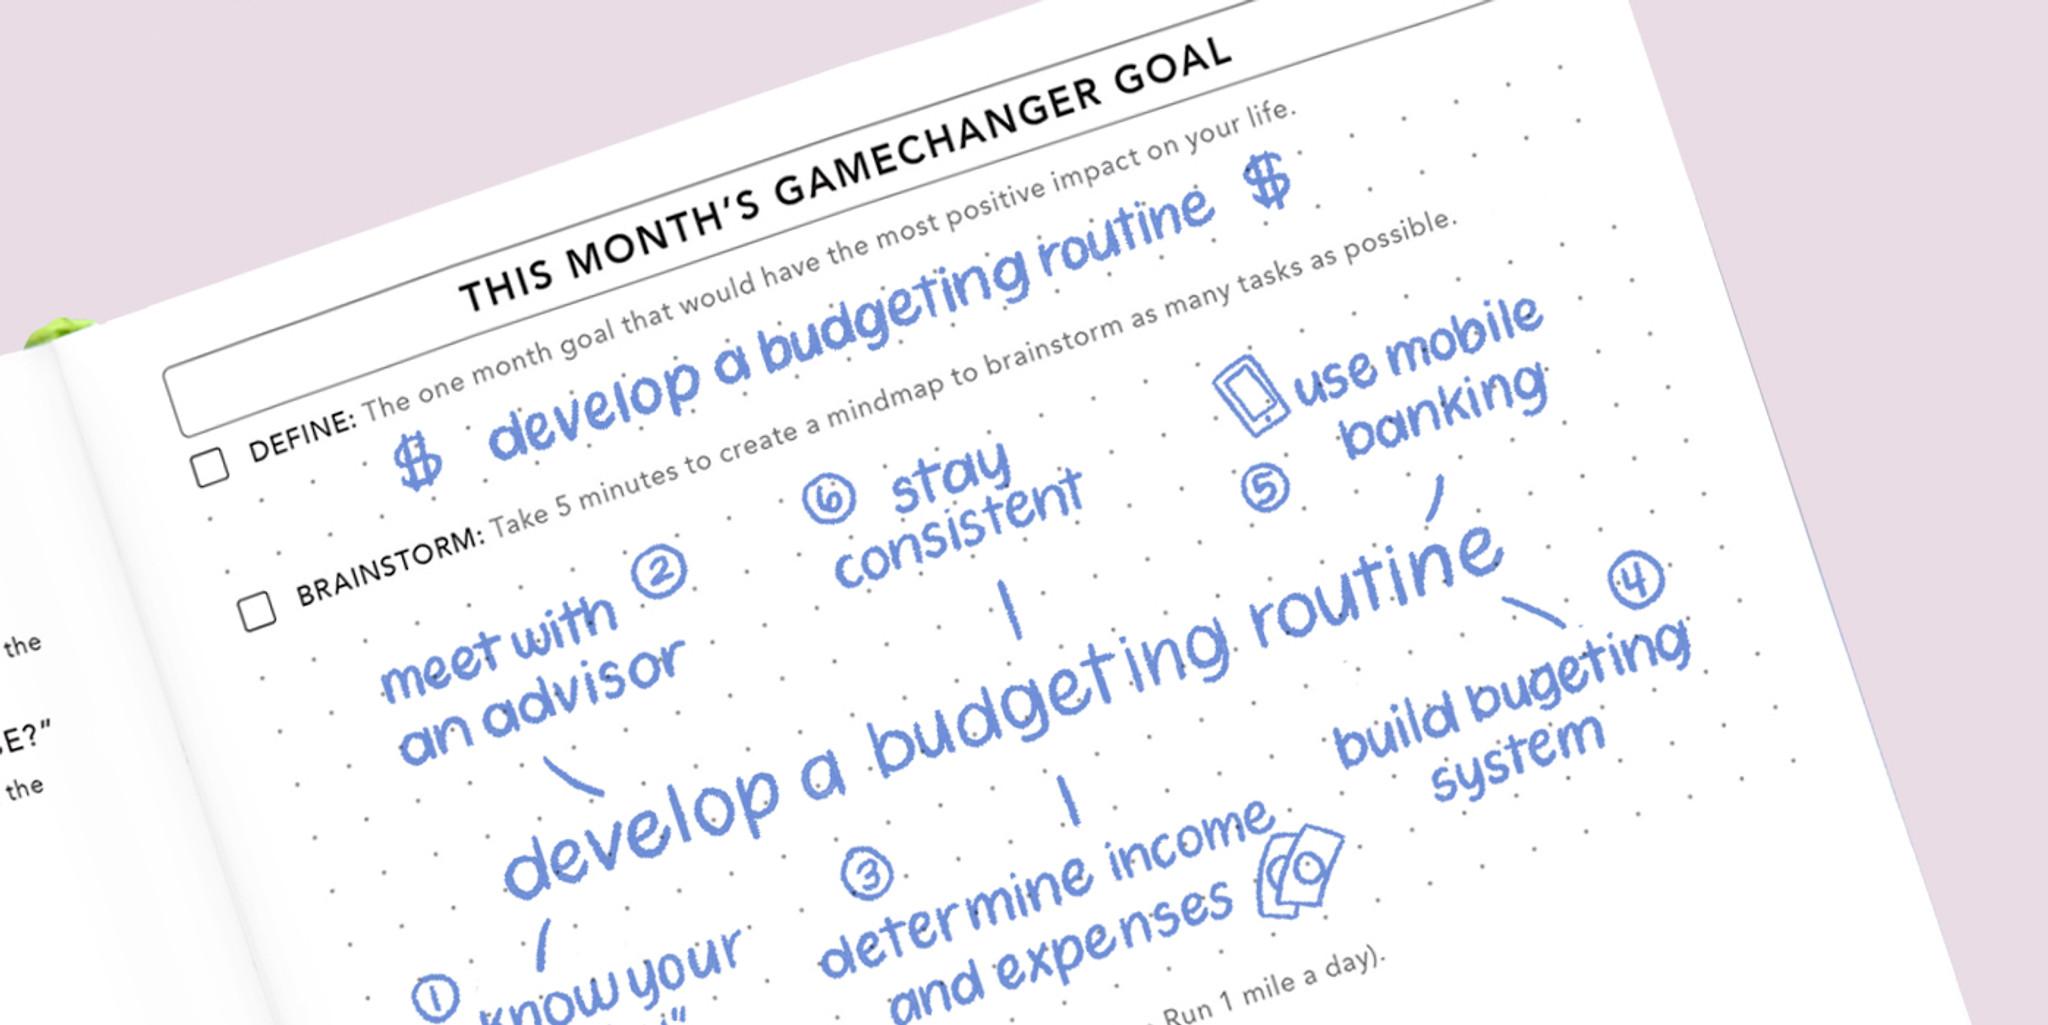 Millennial Money 101: Develop a Budgeting Routine